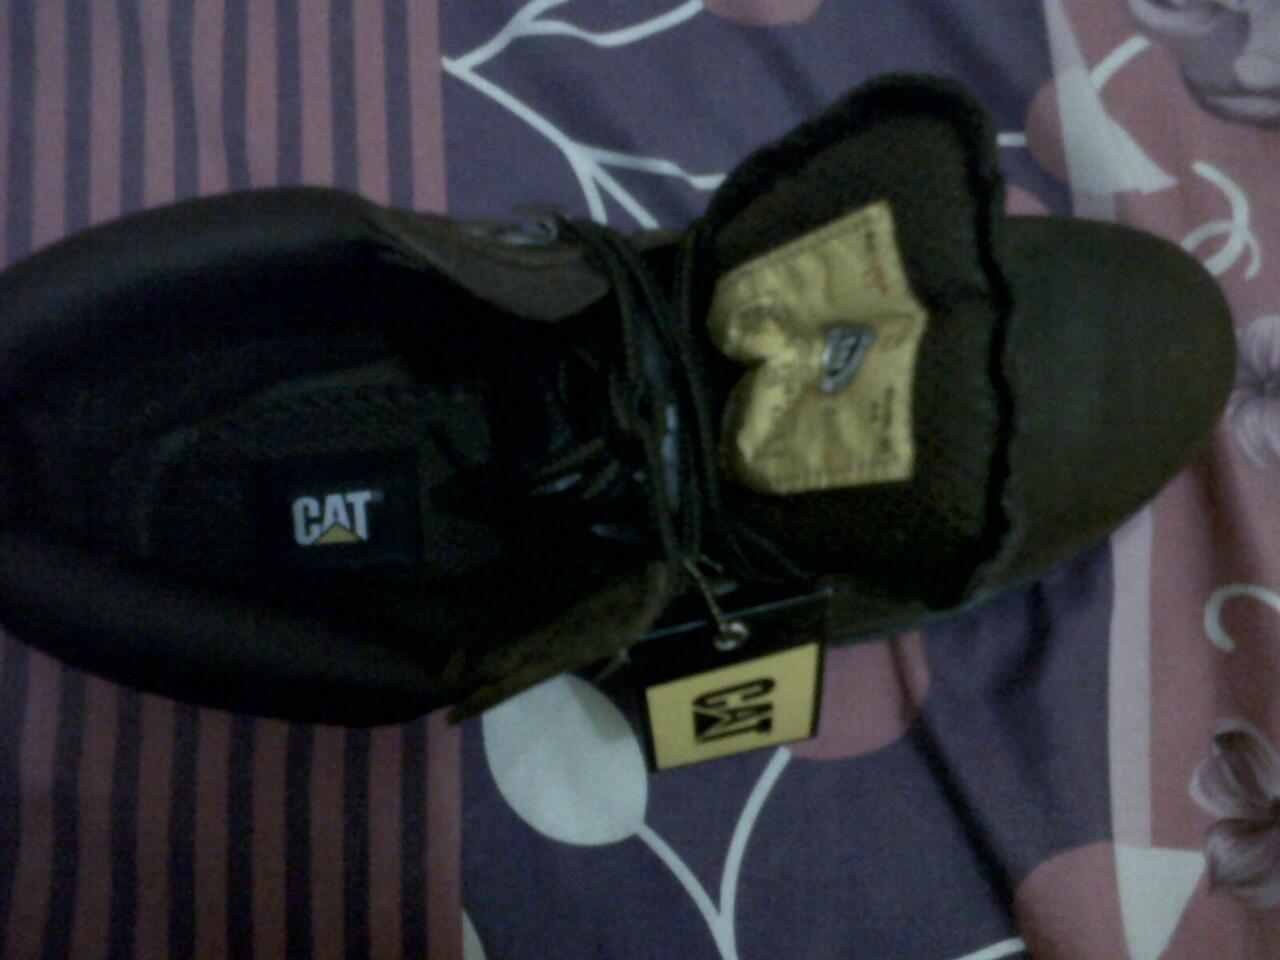 CAT/ CATERPILLAR, ORIGINAL NEW WITH BOX & TAG